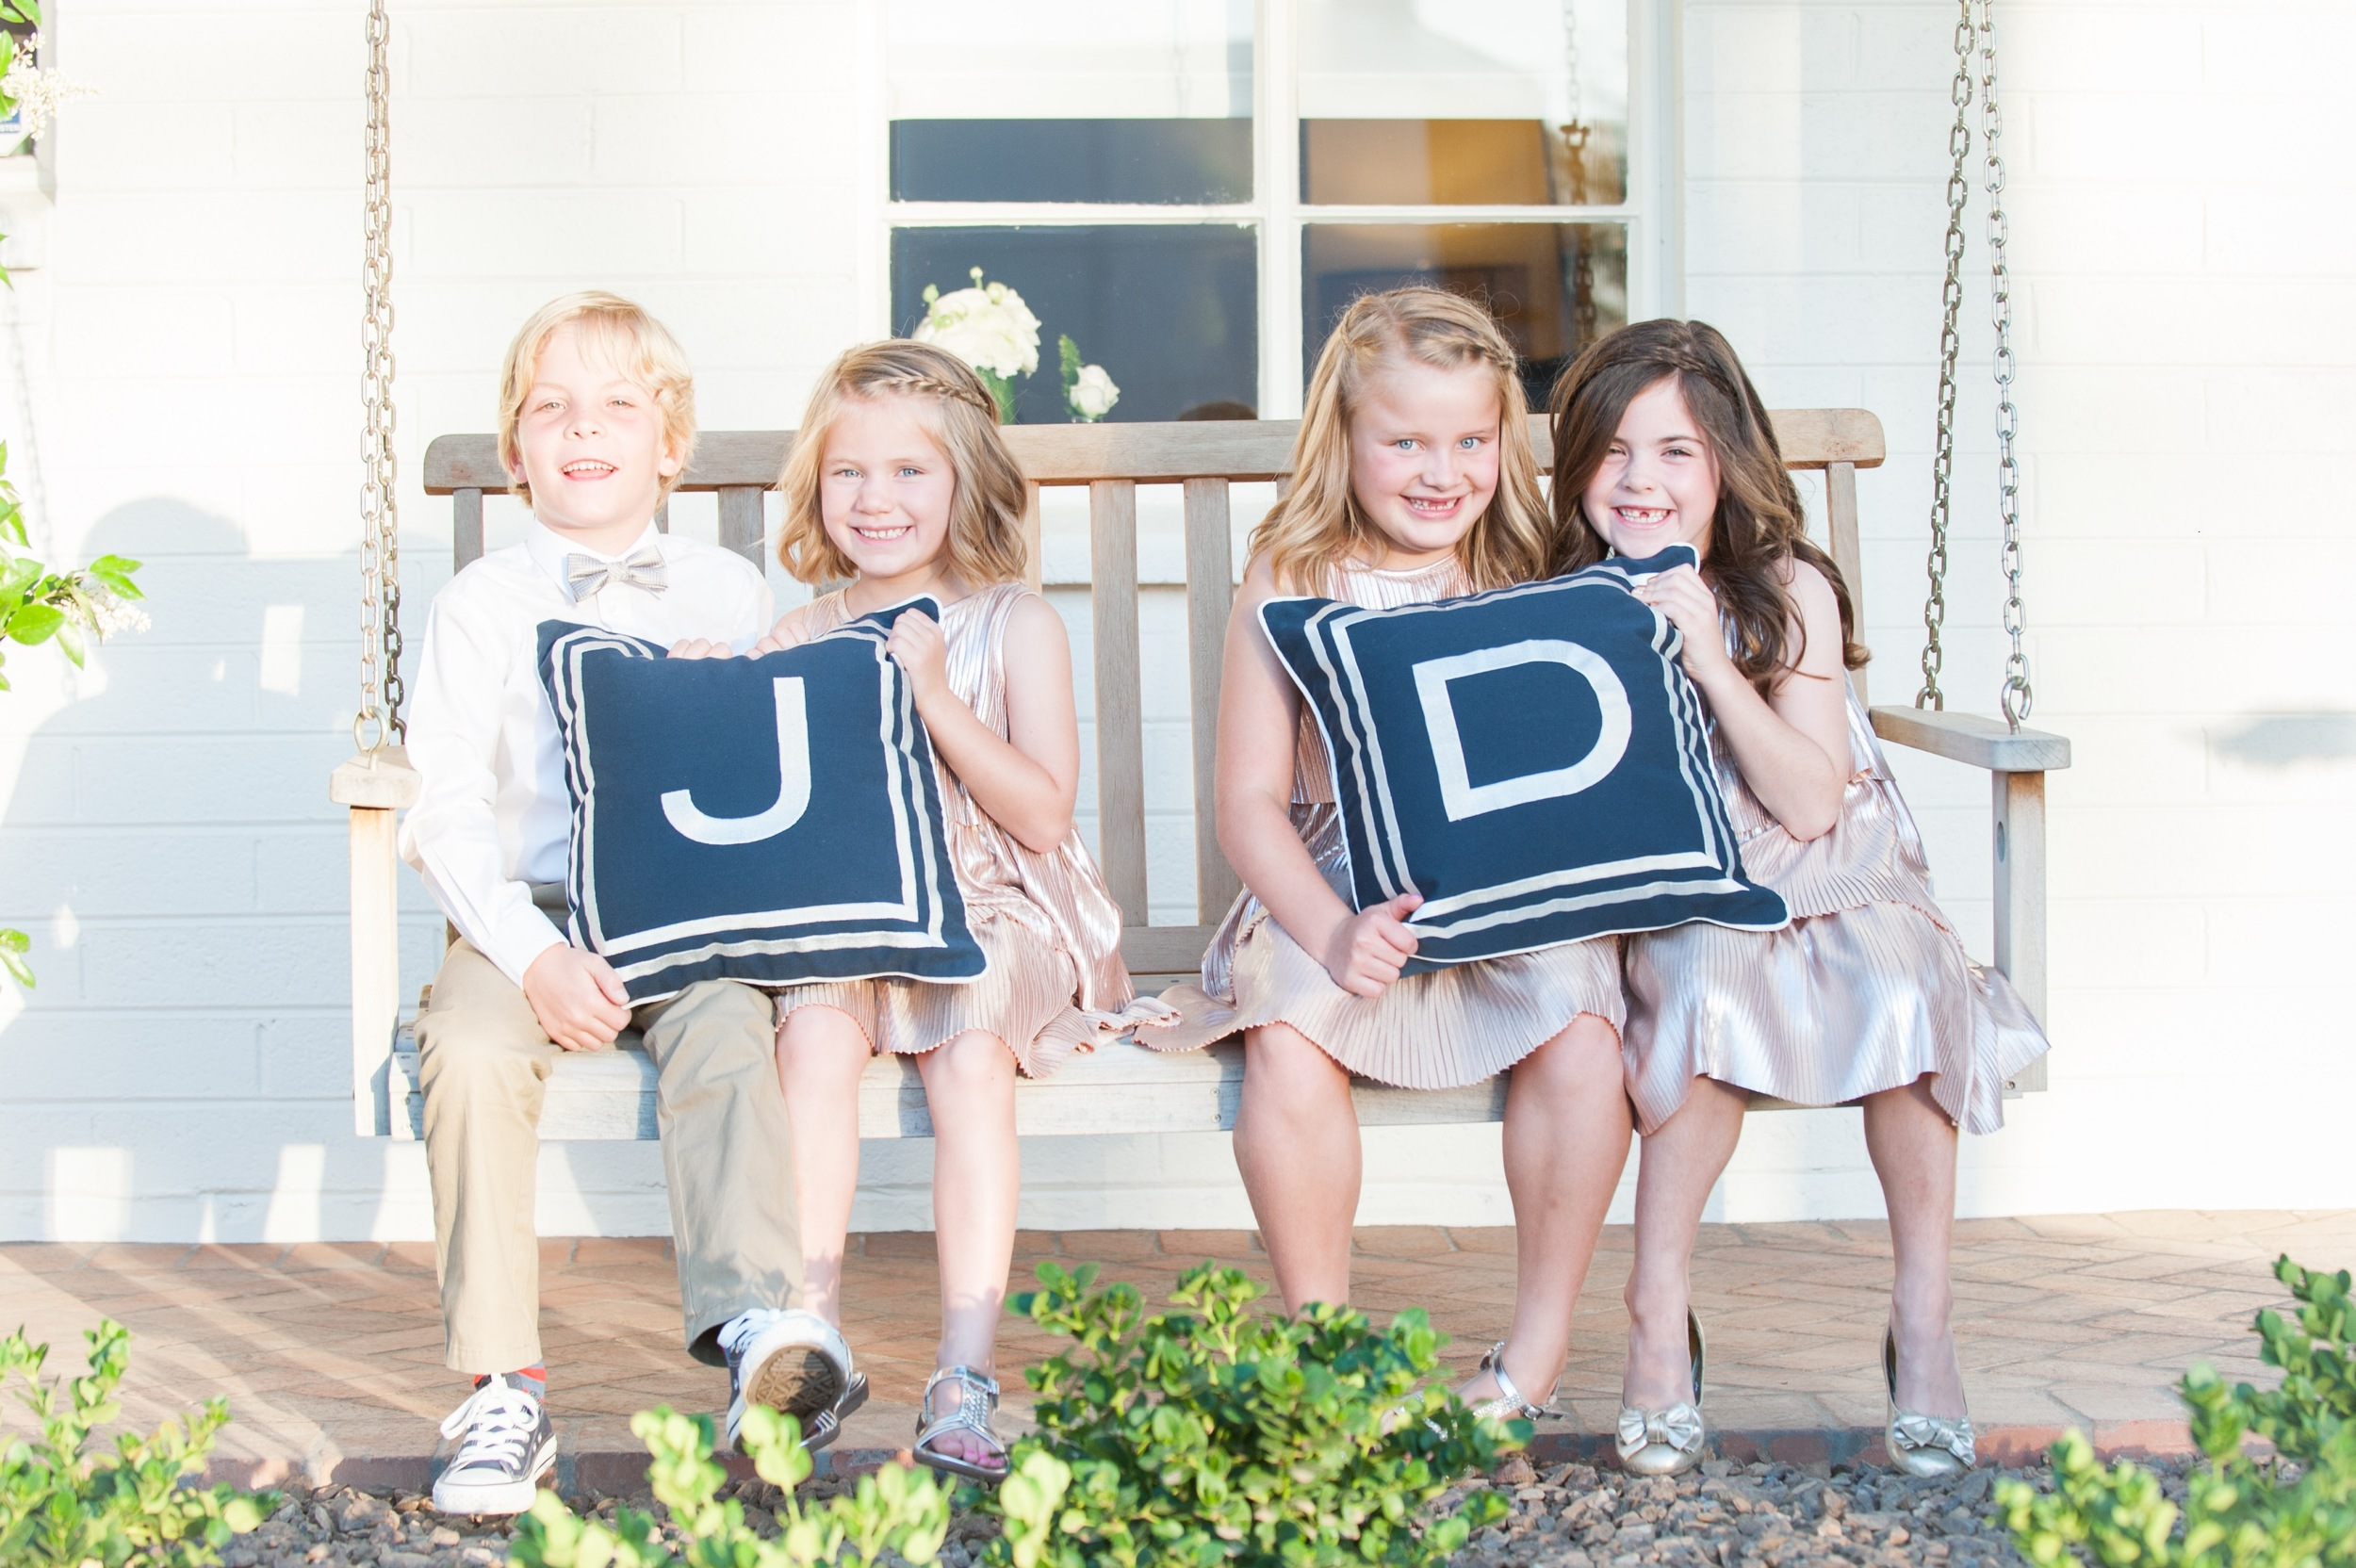 Lucky & In Love Arizona Wedding Planner and Event Designer